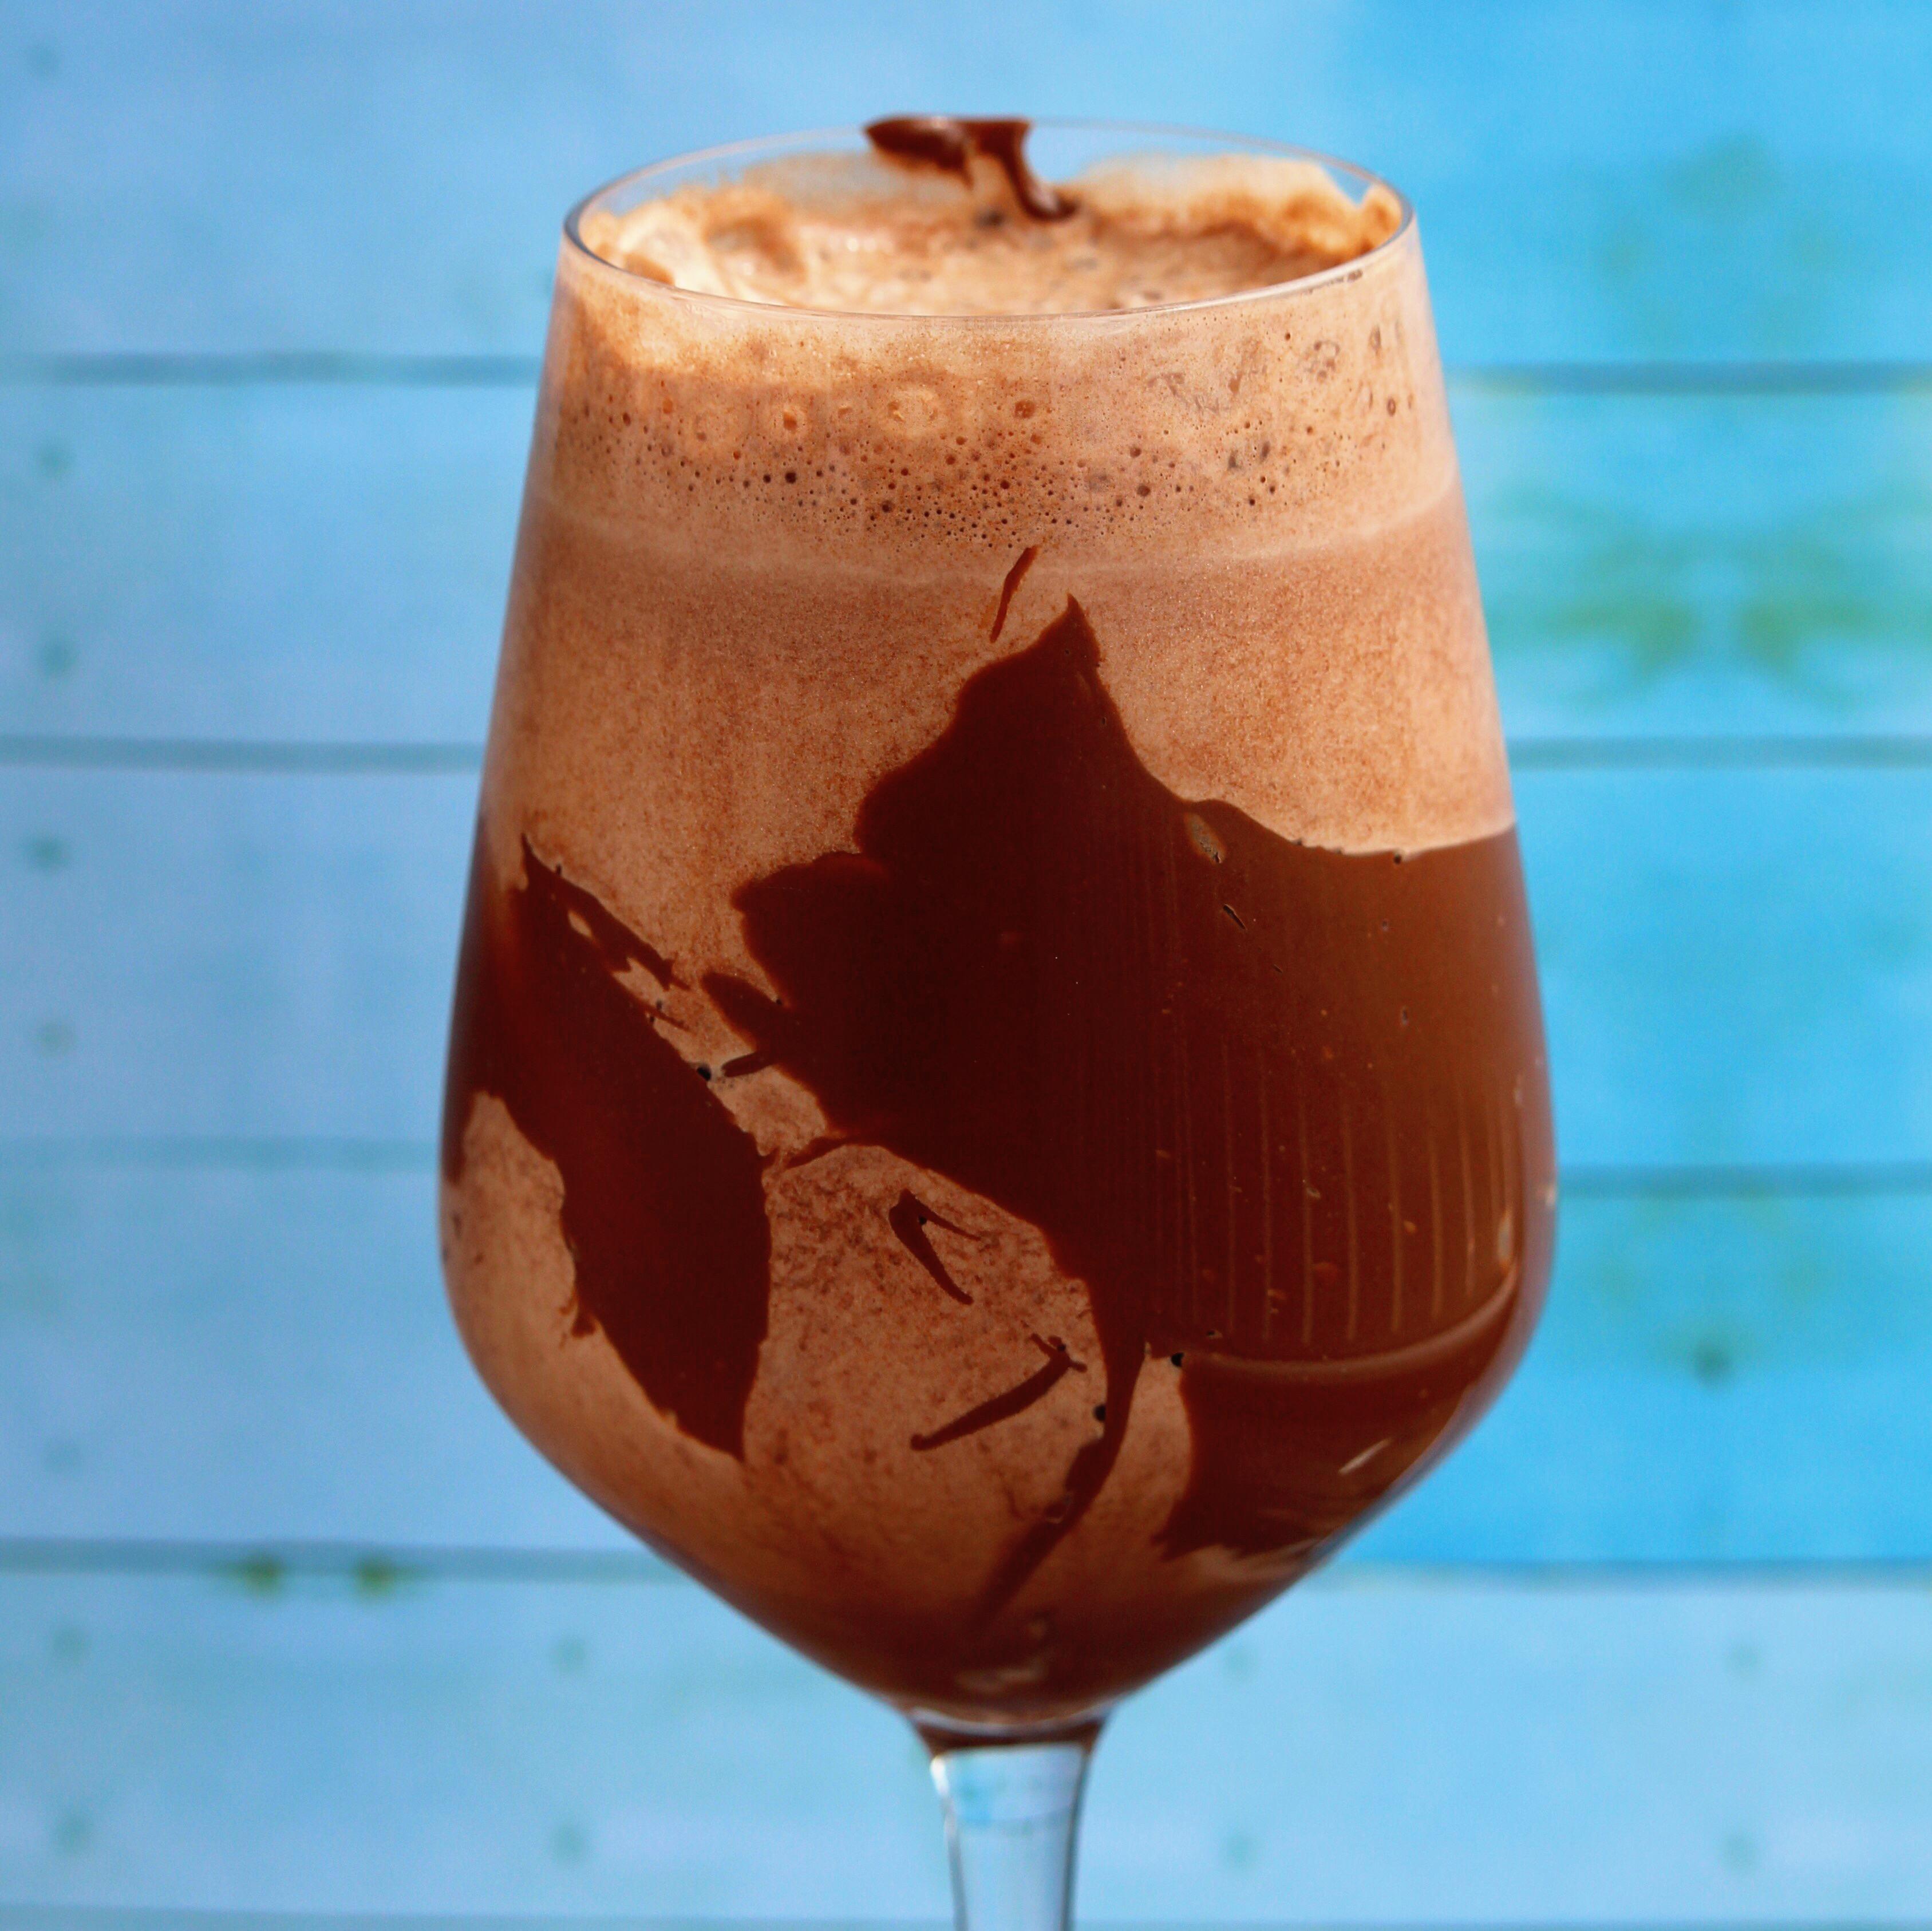 Skinny Chocolate Mocha Shake